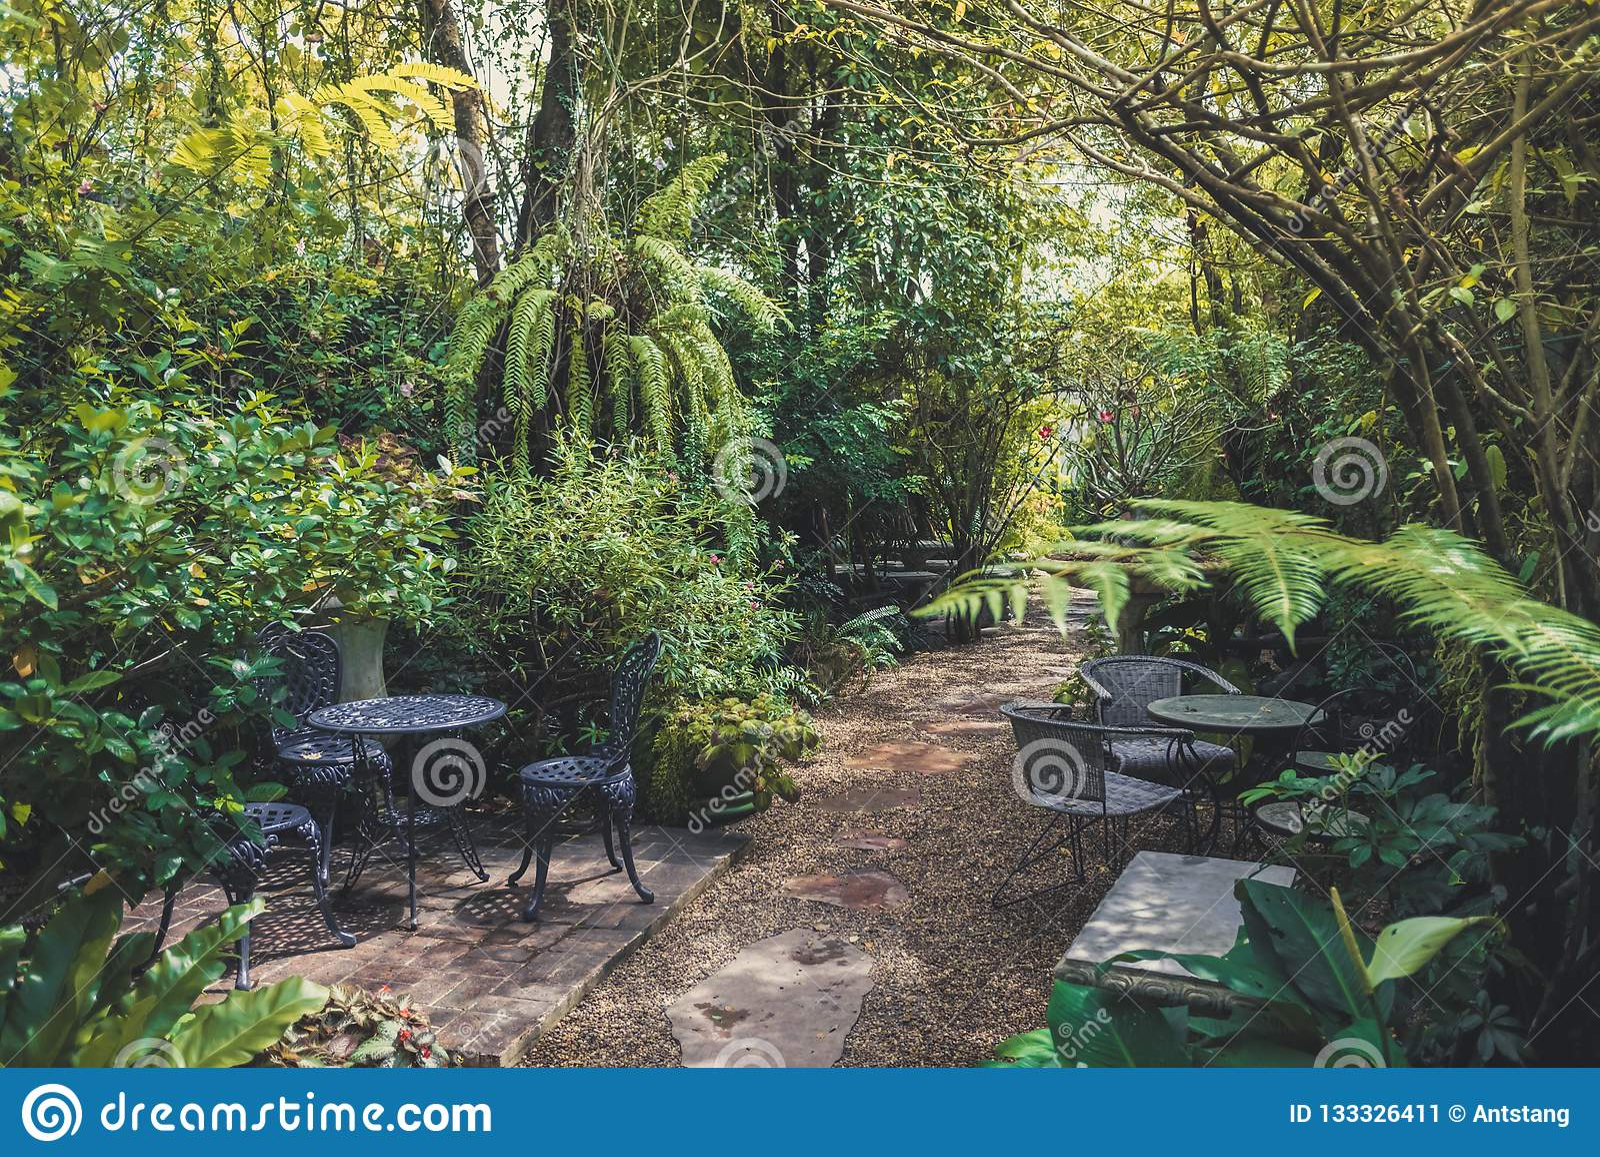 Tropical English Garden Style For Home Interior Decoration Stock